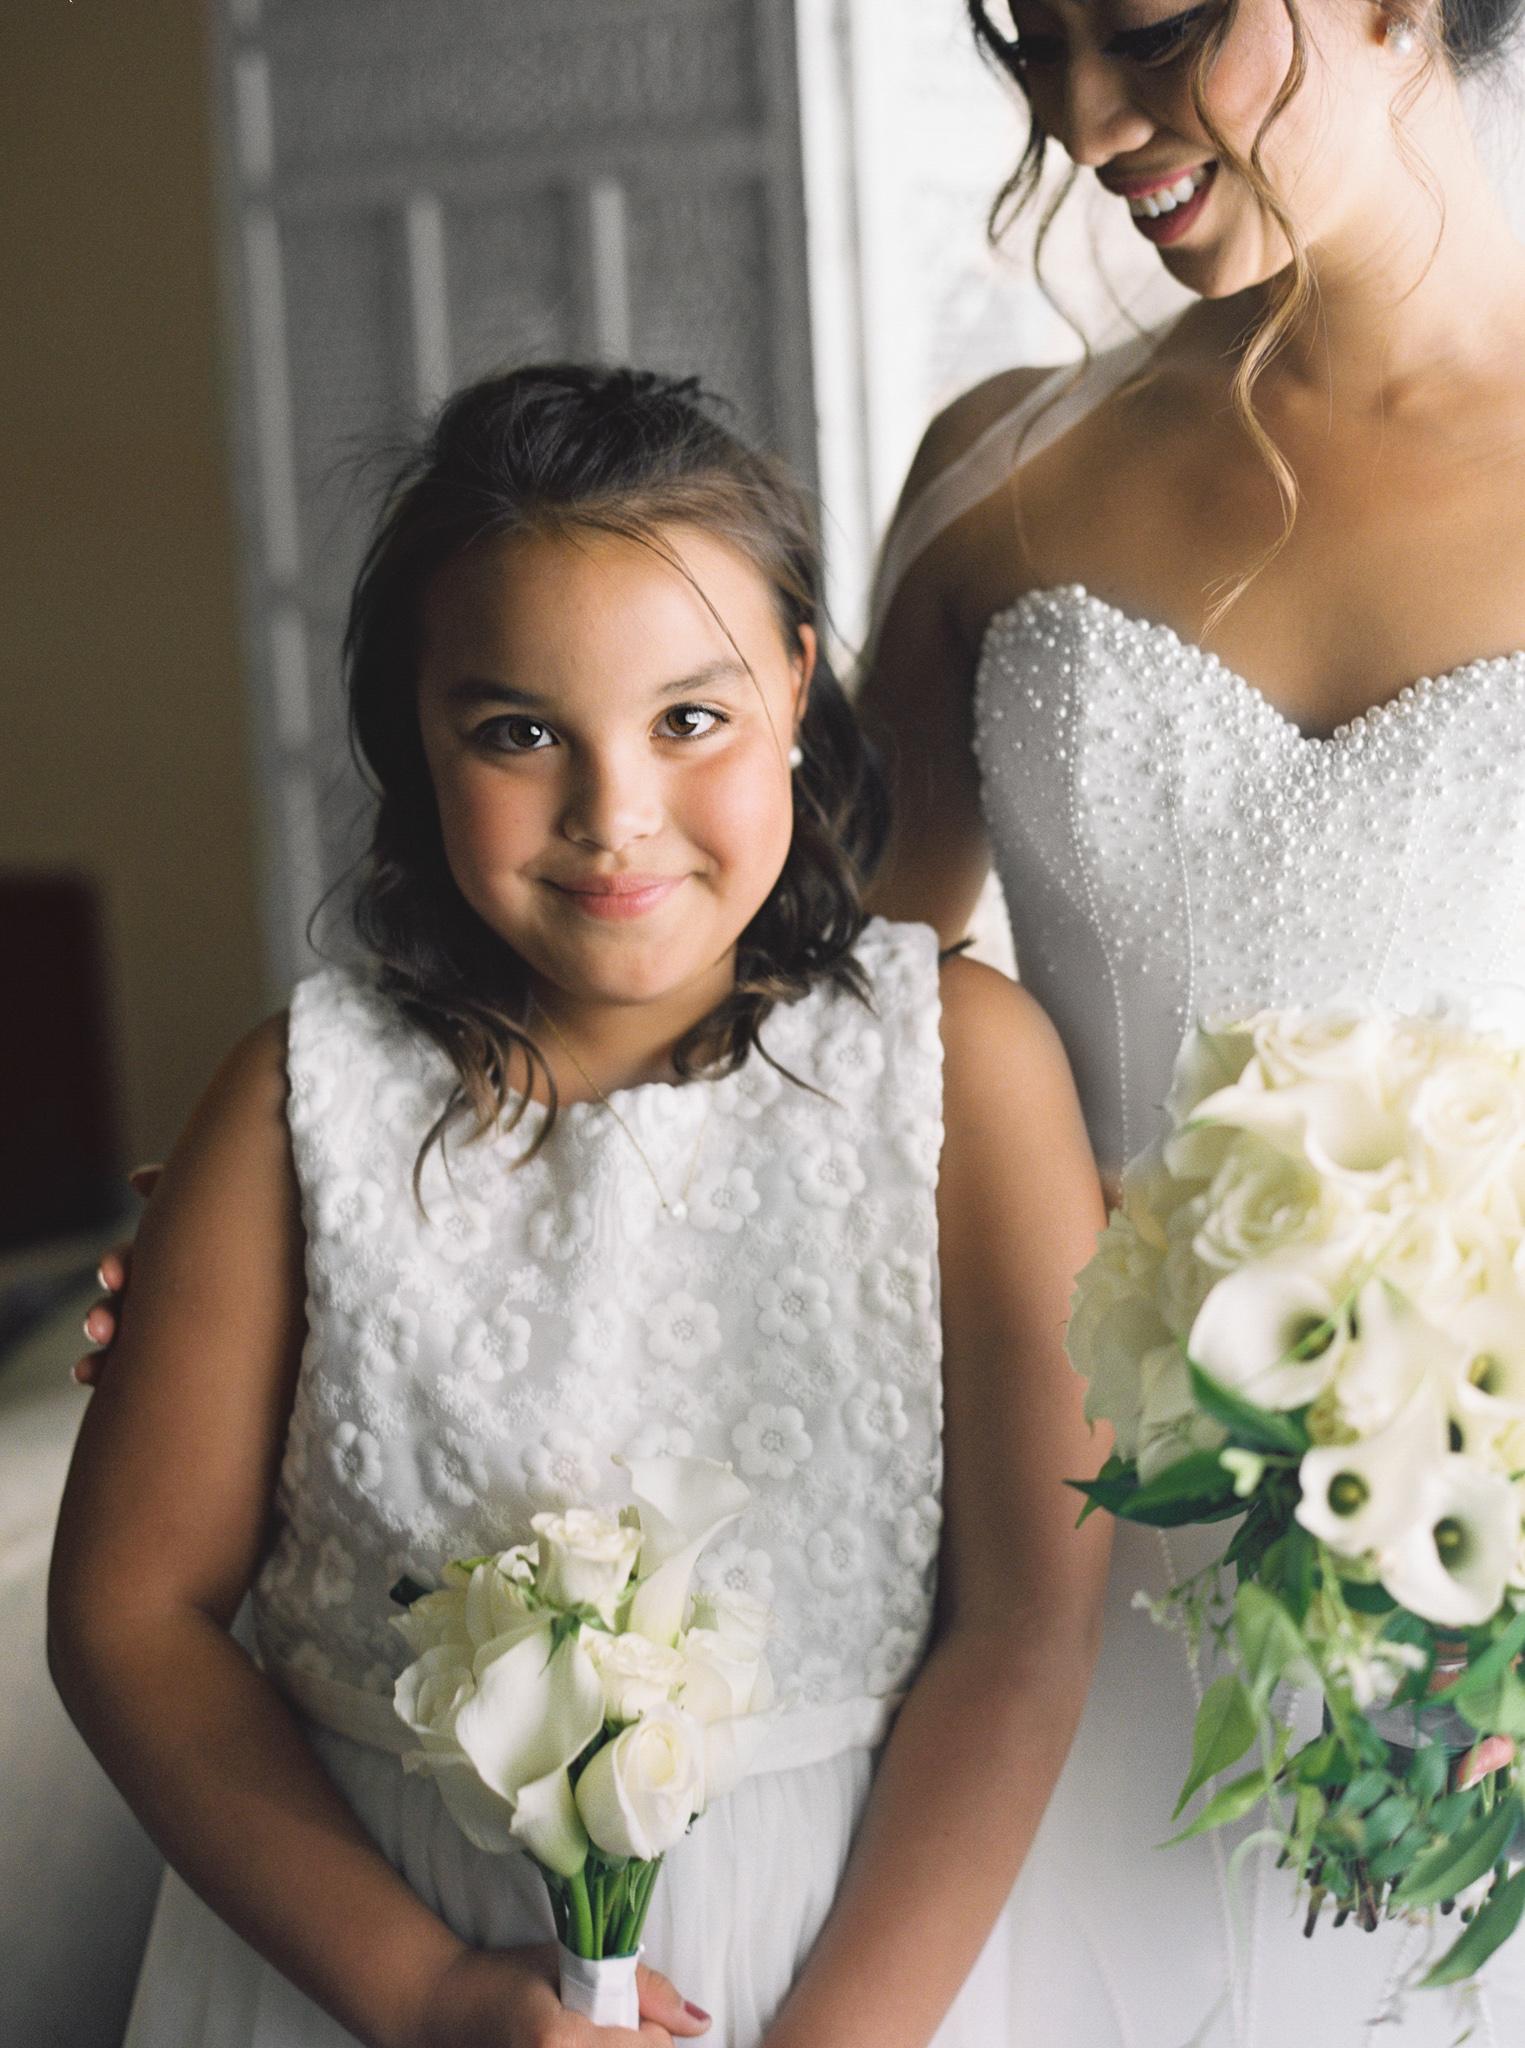 039OutliveCreative_Travel_Photographer_Videographer_Lewis&Clark_Oregon_Elegant_BlackTie_Destination_Wedding.jpg